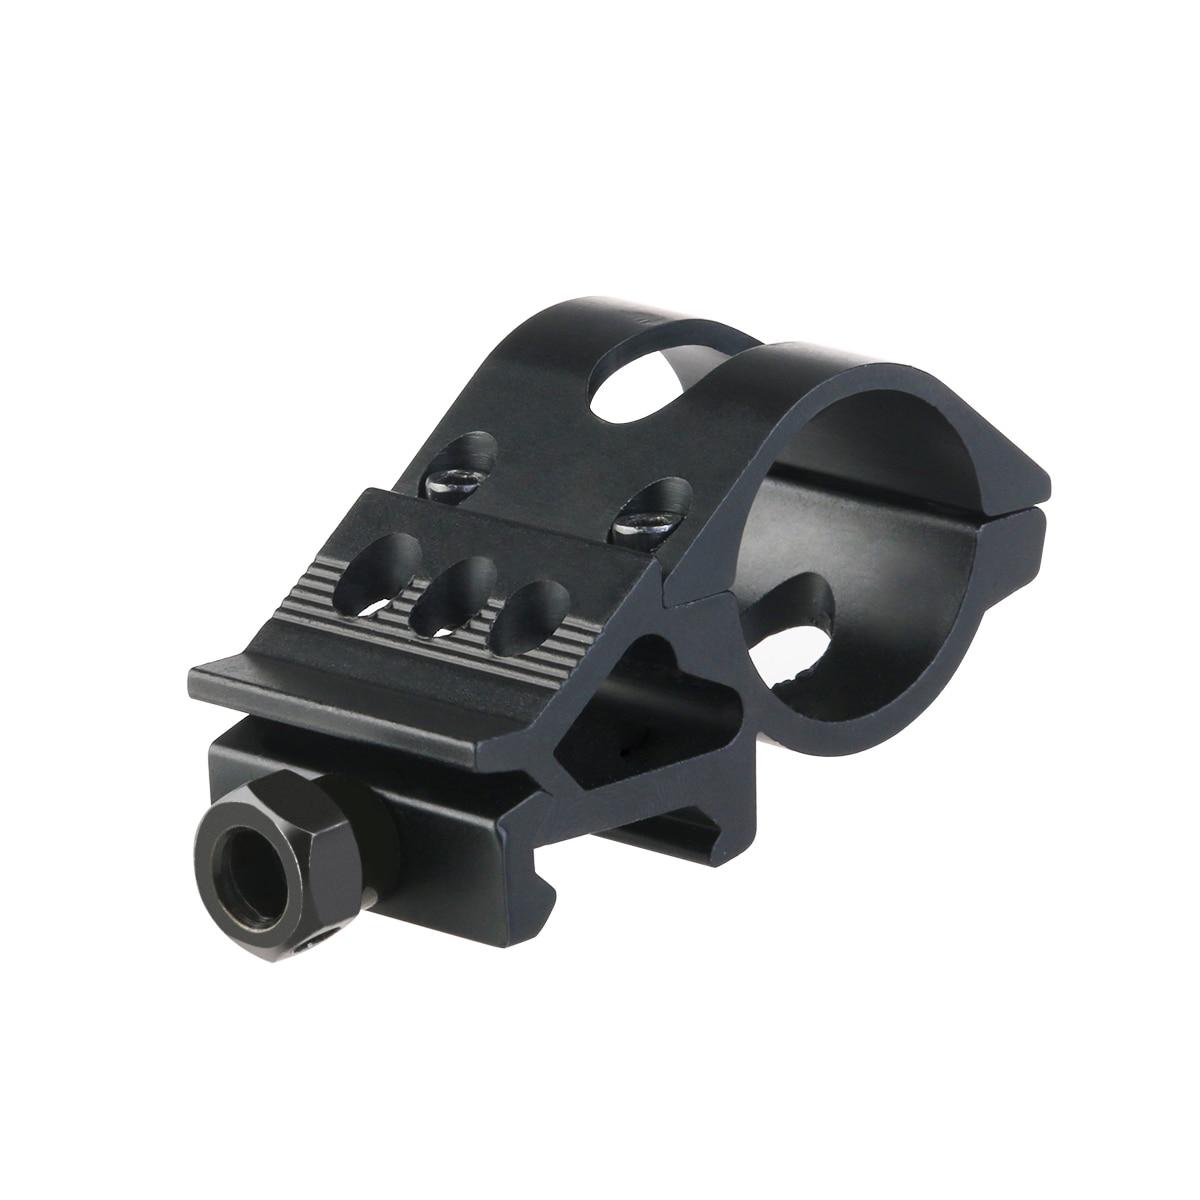 1pc 25mm LED Light Torch Mount Clamp Stand Holder Flashlight Offset Gun Mount